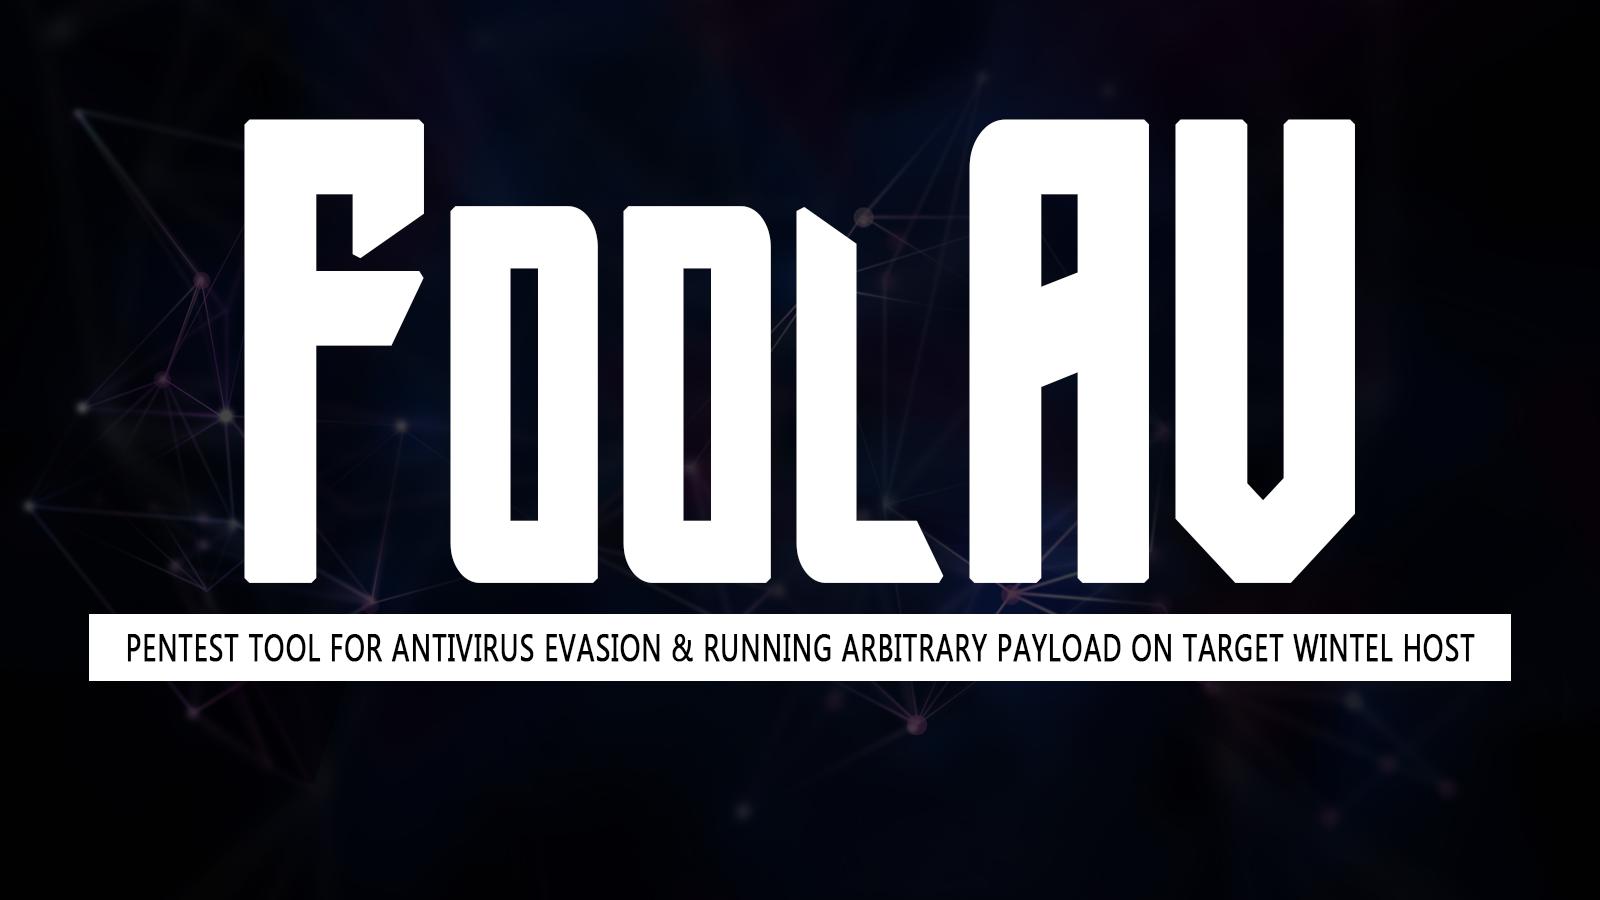 FoolAV - Pentest Tool for Antivirus Evasion & Running Arbitrary Payload on Target Wintel Host